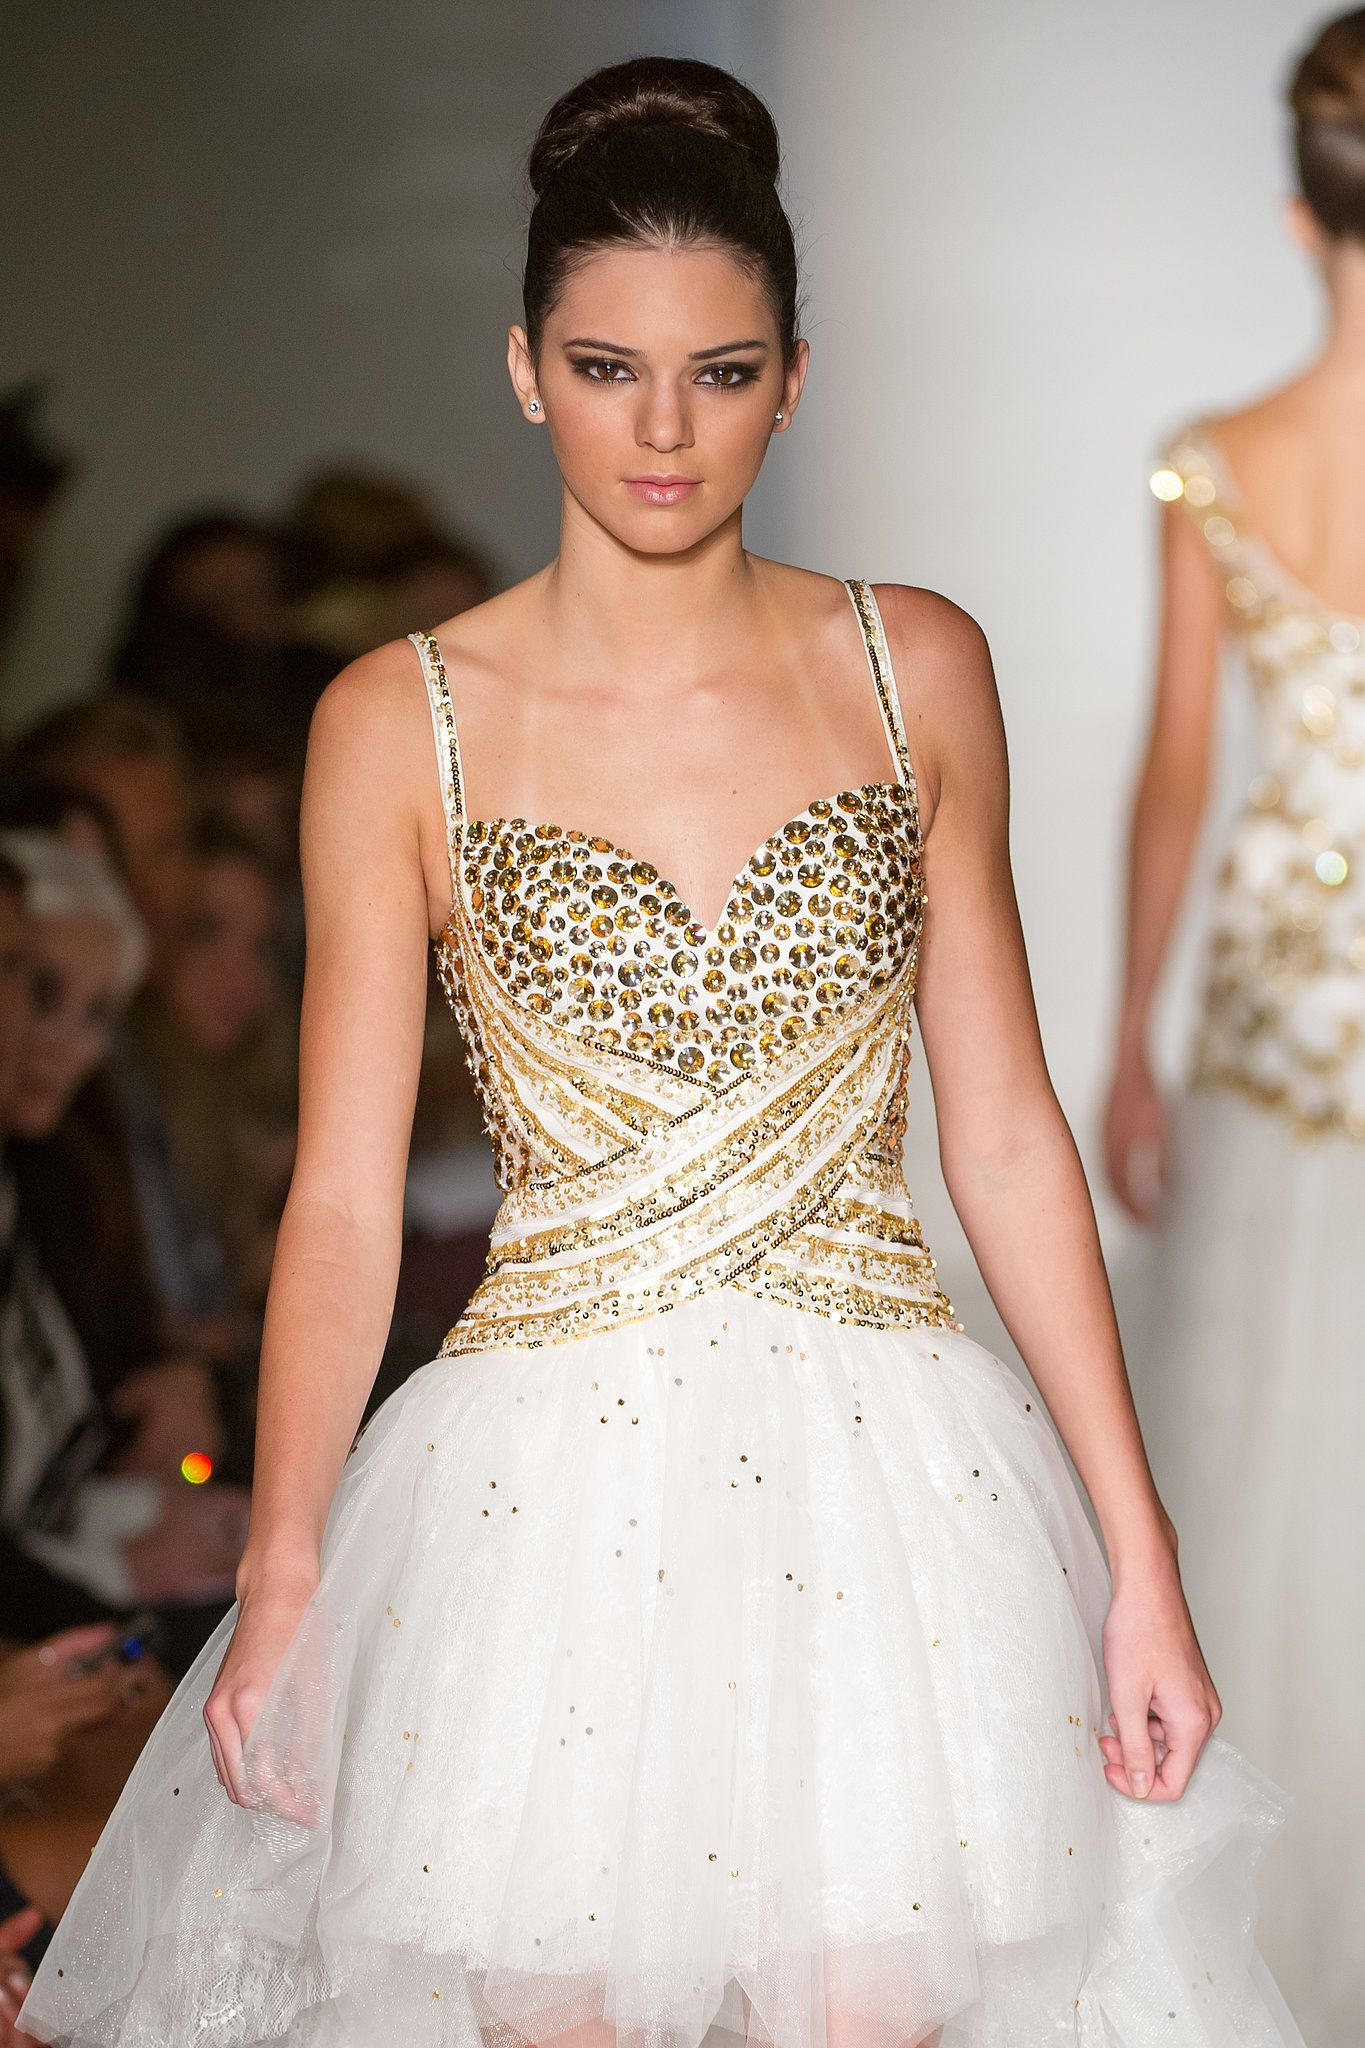 Kendall Jenner walks walks the runway at the Evening